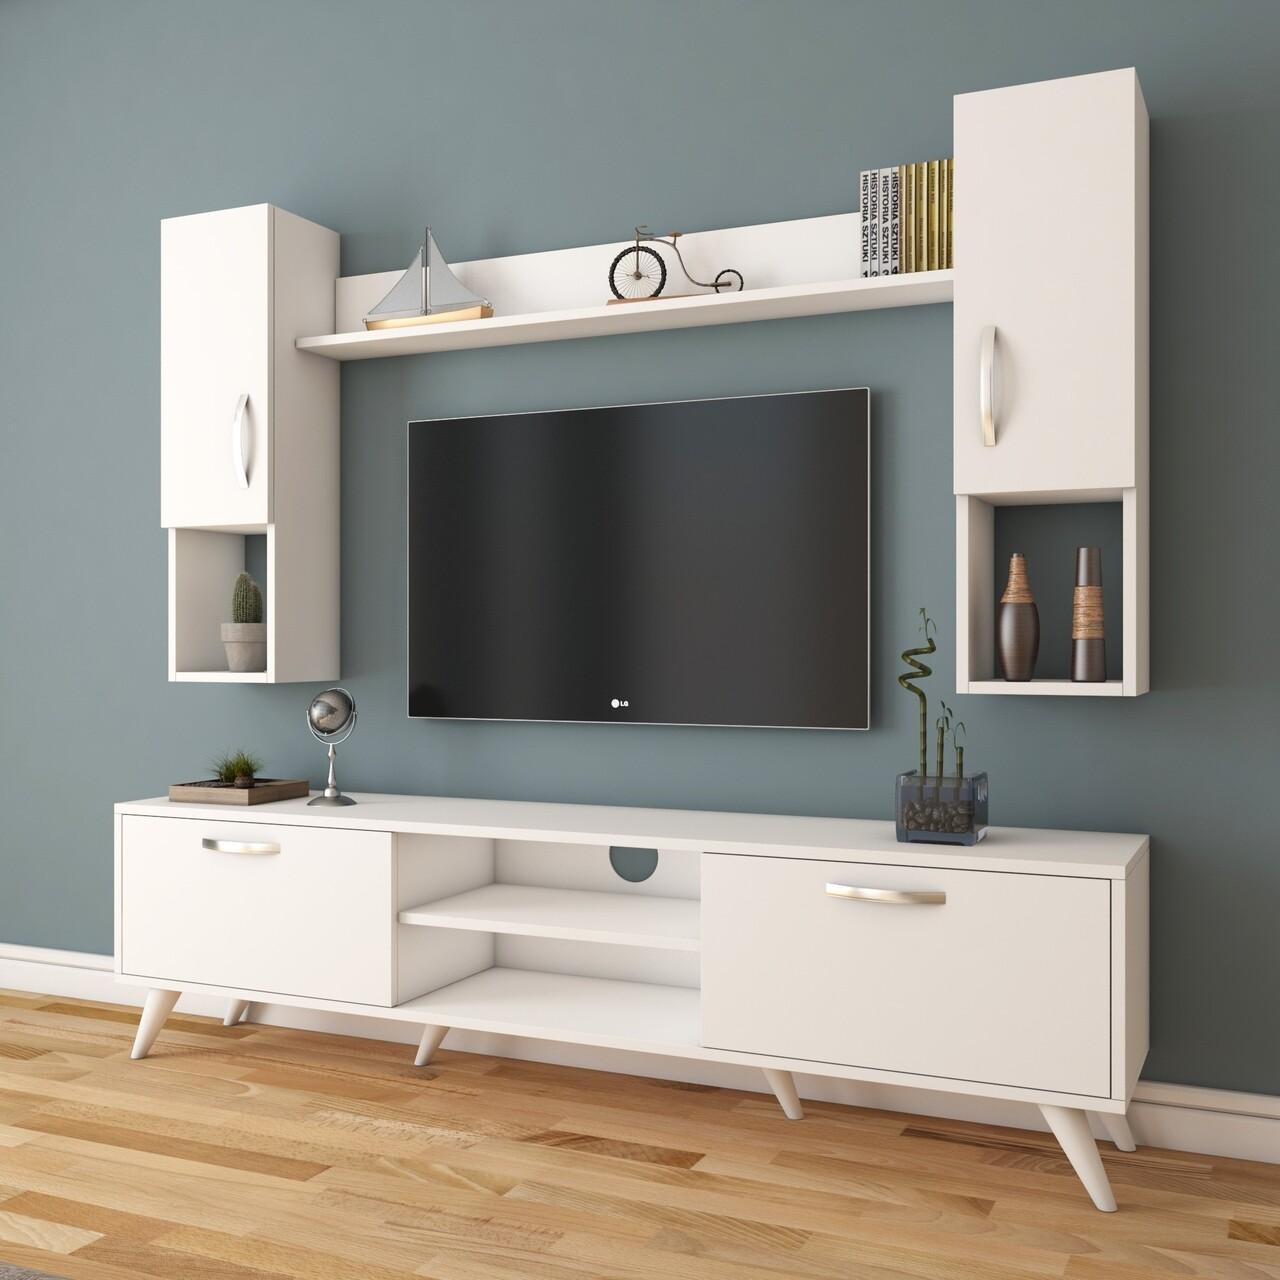 Comoda TV cu raft de perete si 2 cabinete M27 - 283, Wren, 180 x 35 x 48.6 cm/133 cm, white